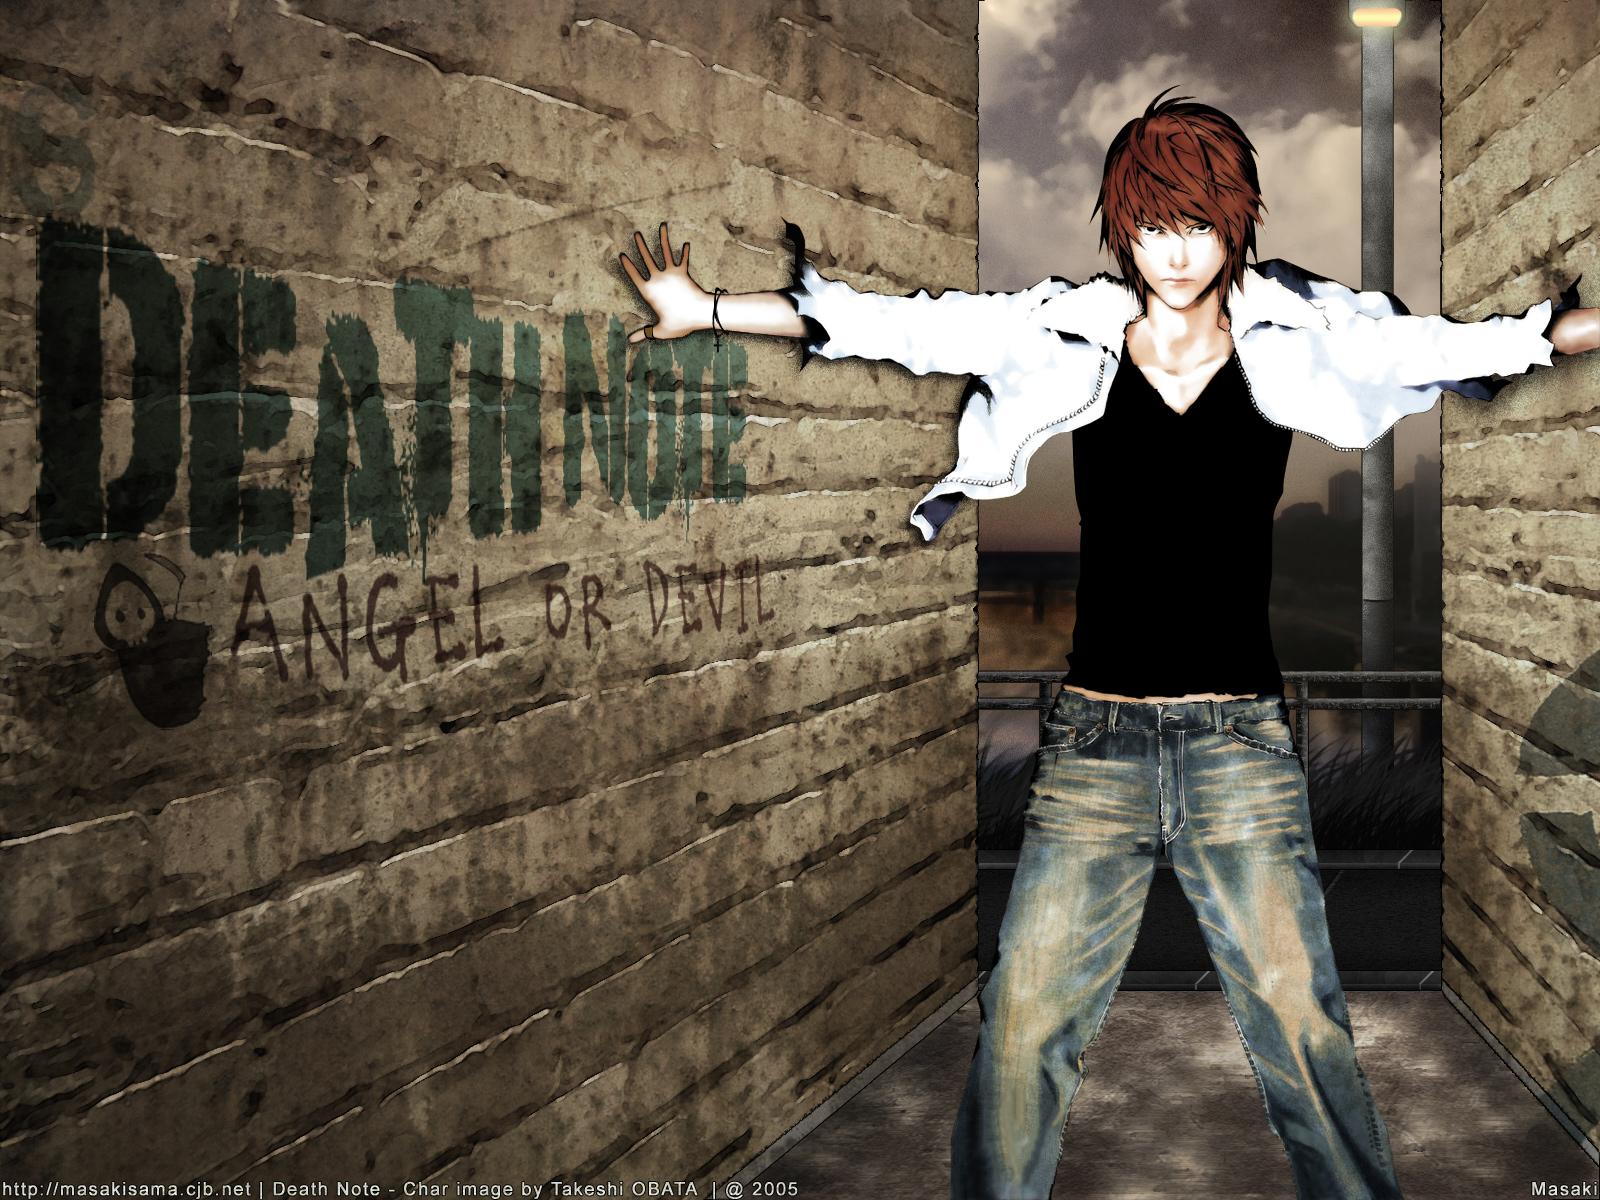 http://4.bp.blogspot.com/-4EshViylpBY/UBQlPOyxwSI/AAAAAAAABe8/toLFmL9qM6o/s1600/death_note_light_yagami_raito_anime_kira_desktop_1600x1200_wallpaper-369487.jpg